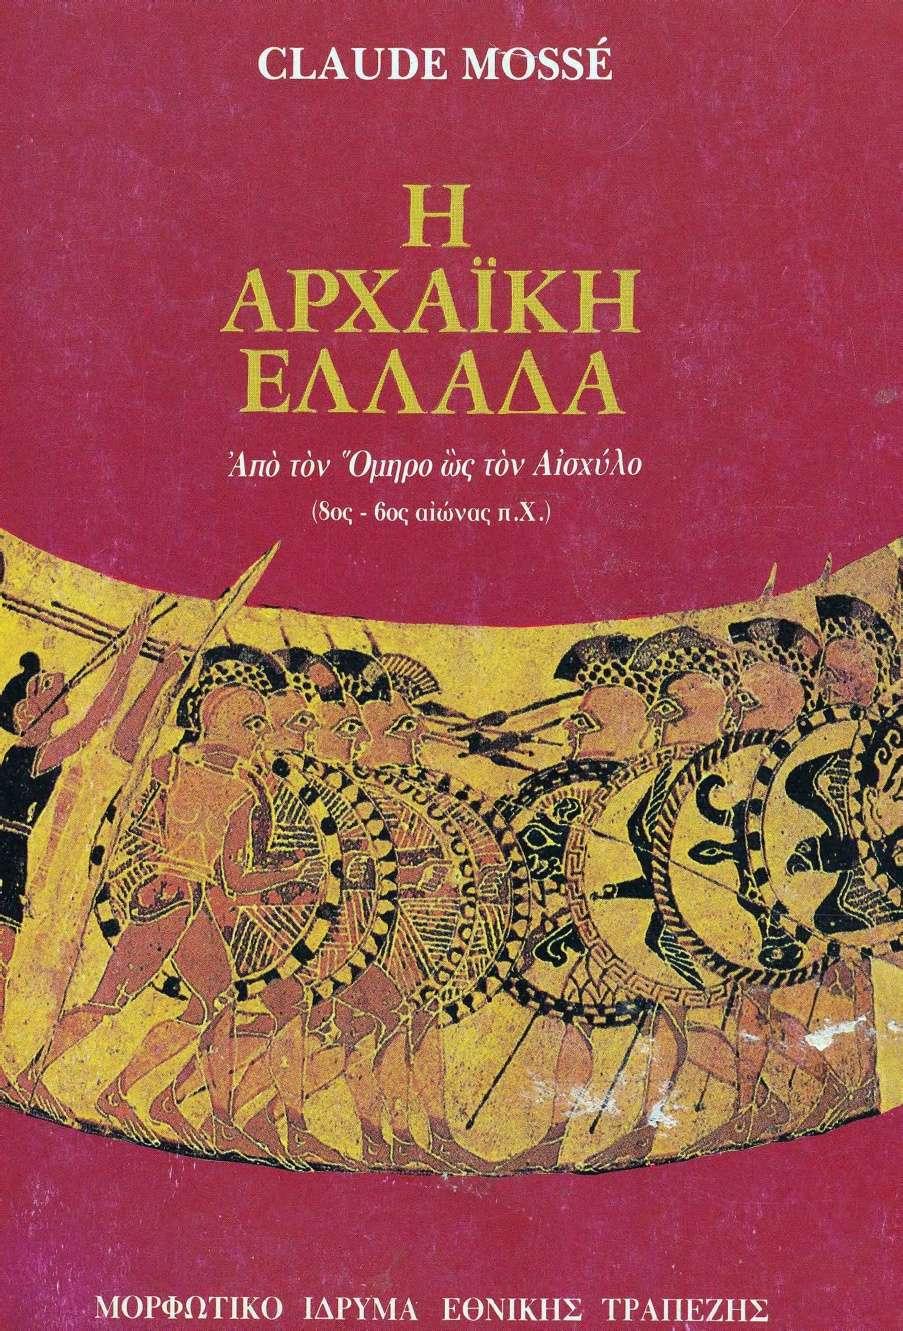 Claude Mosse: Η αρχαϊκή Ελλάδα (PDF)